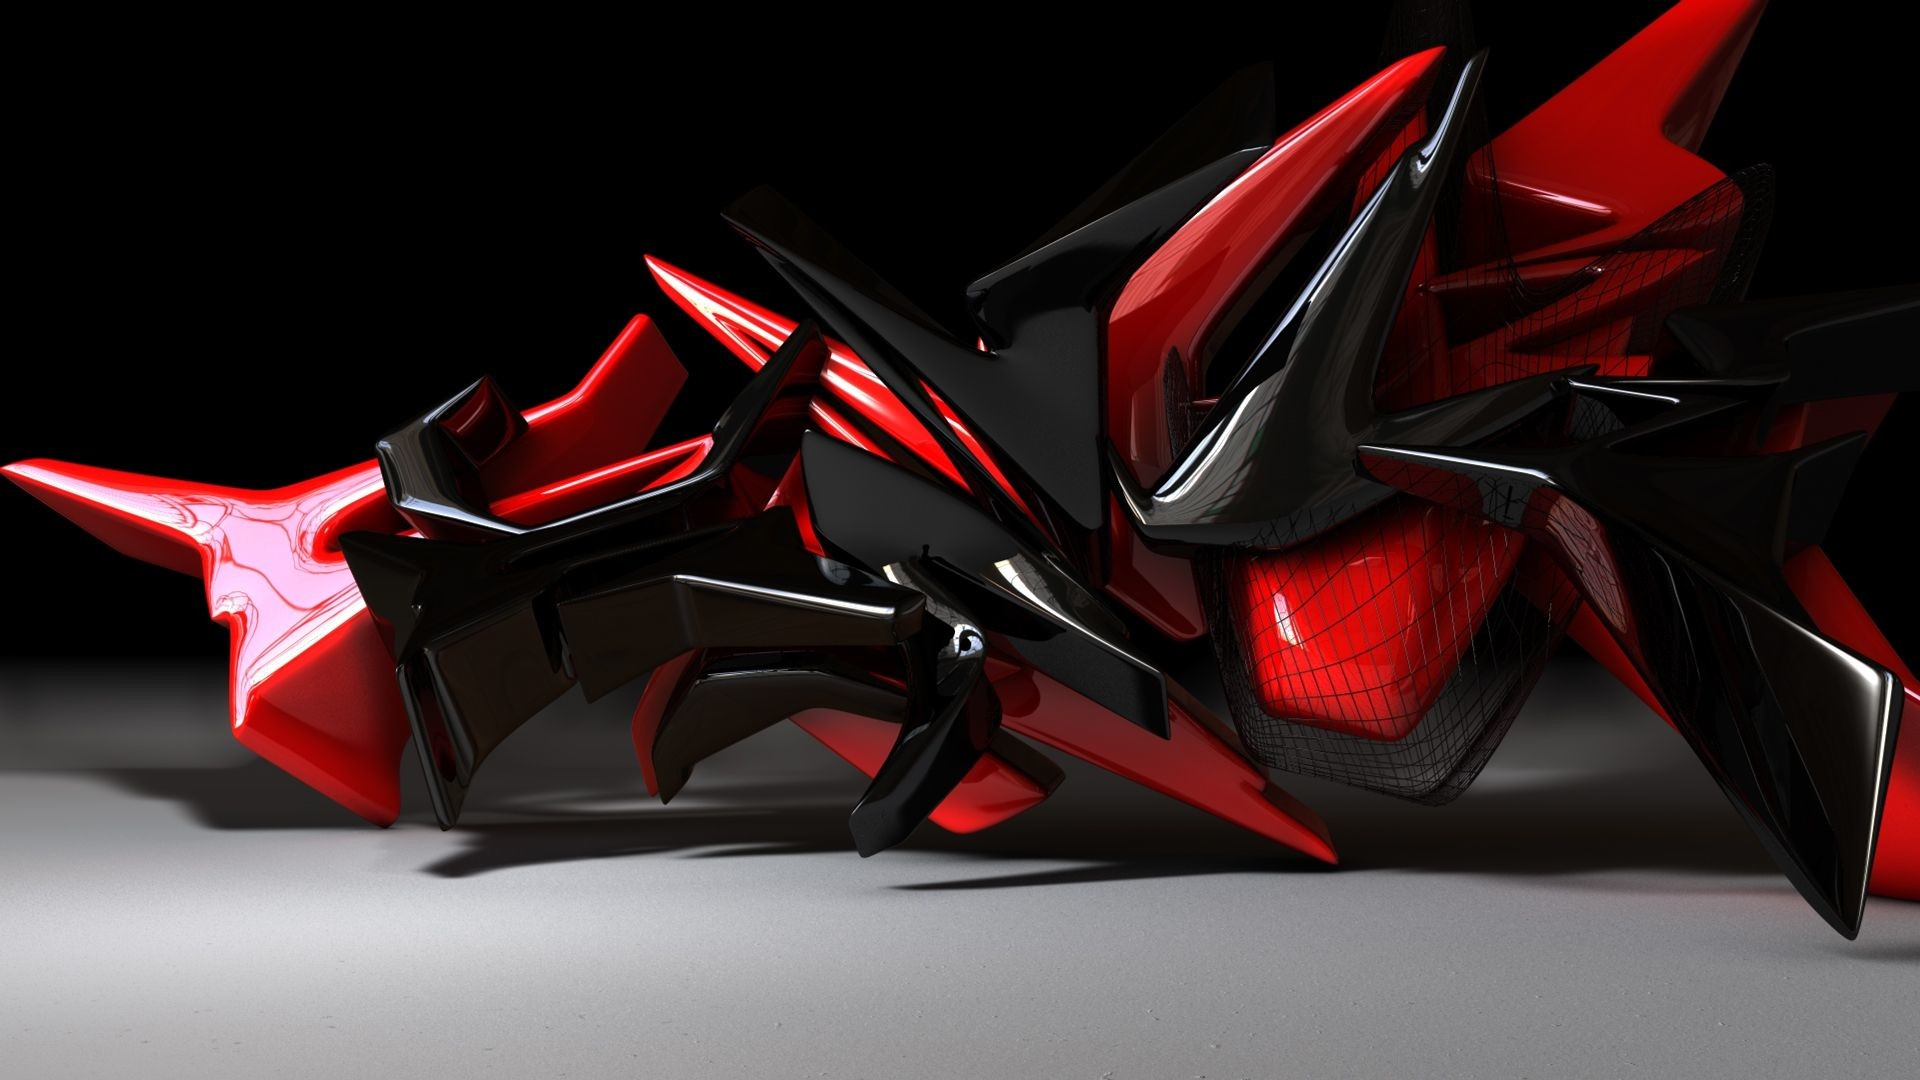 <b>Red Black Abstract Wallpaper</b>